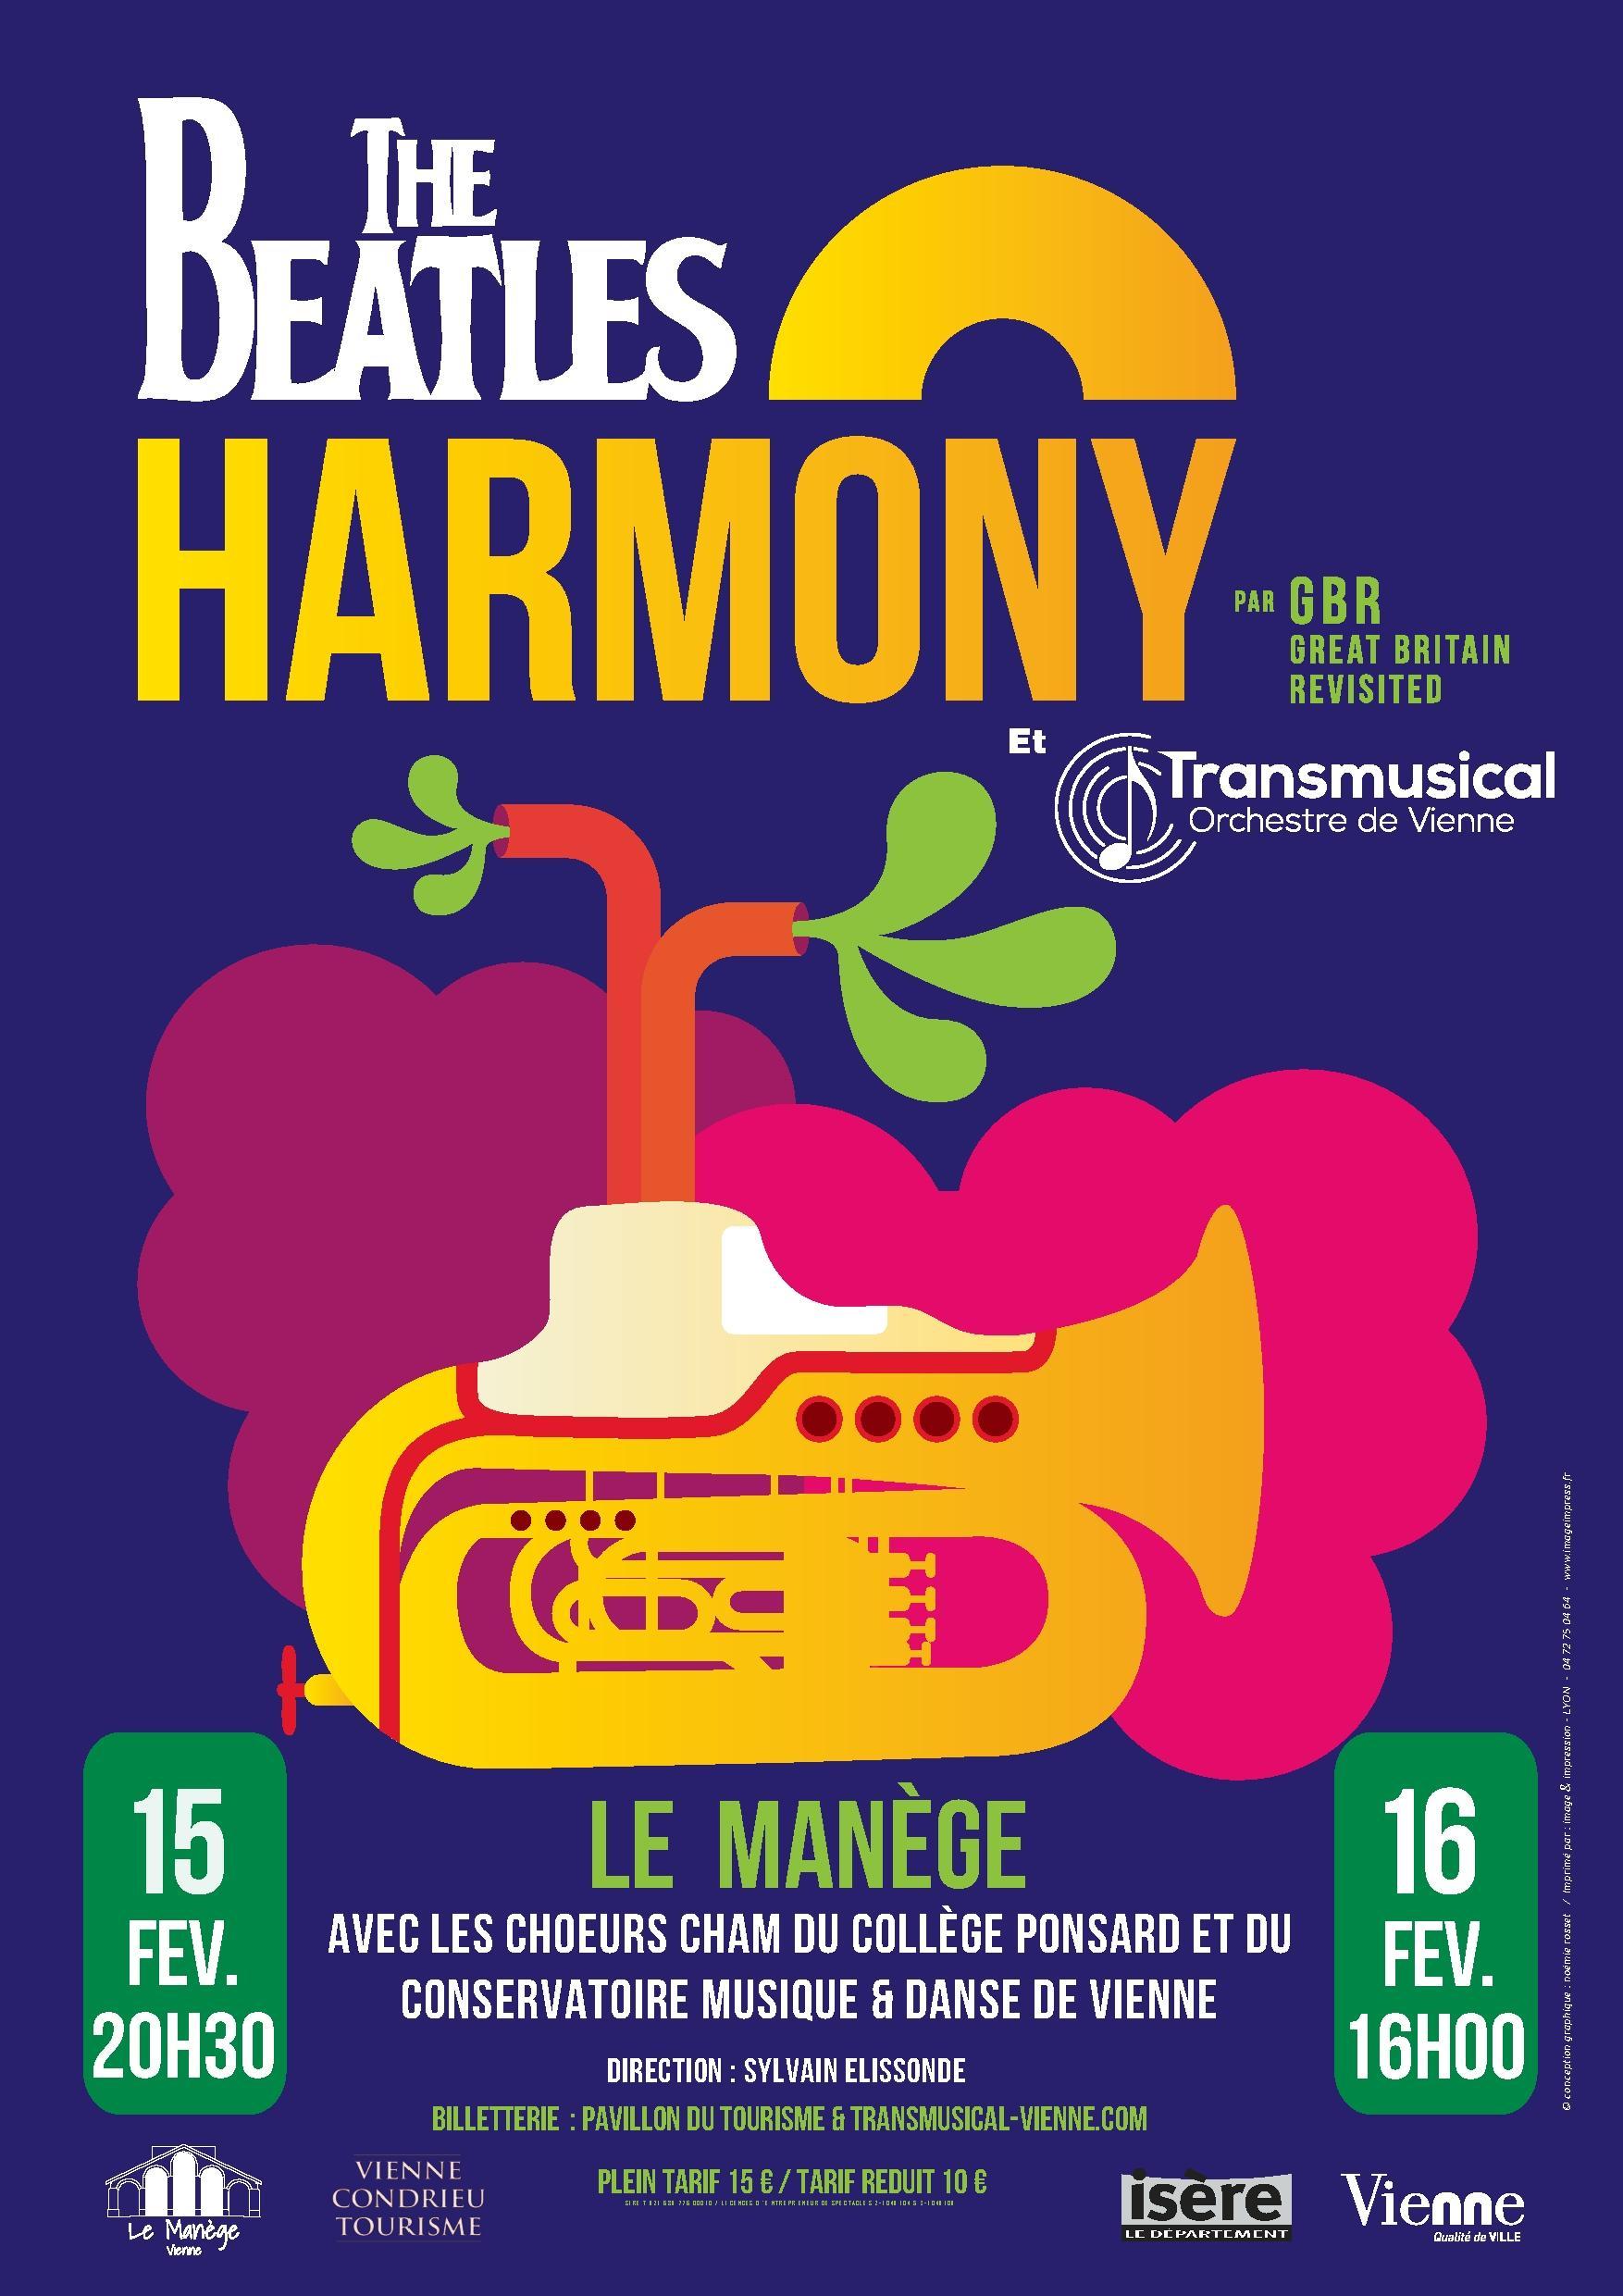 Transmusical Orchestre de Vienne Beatles Harmony